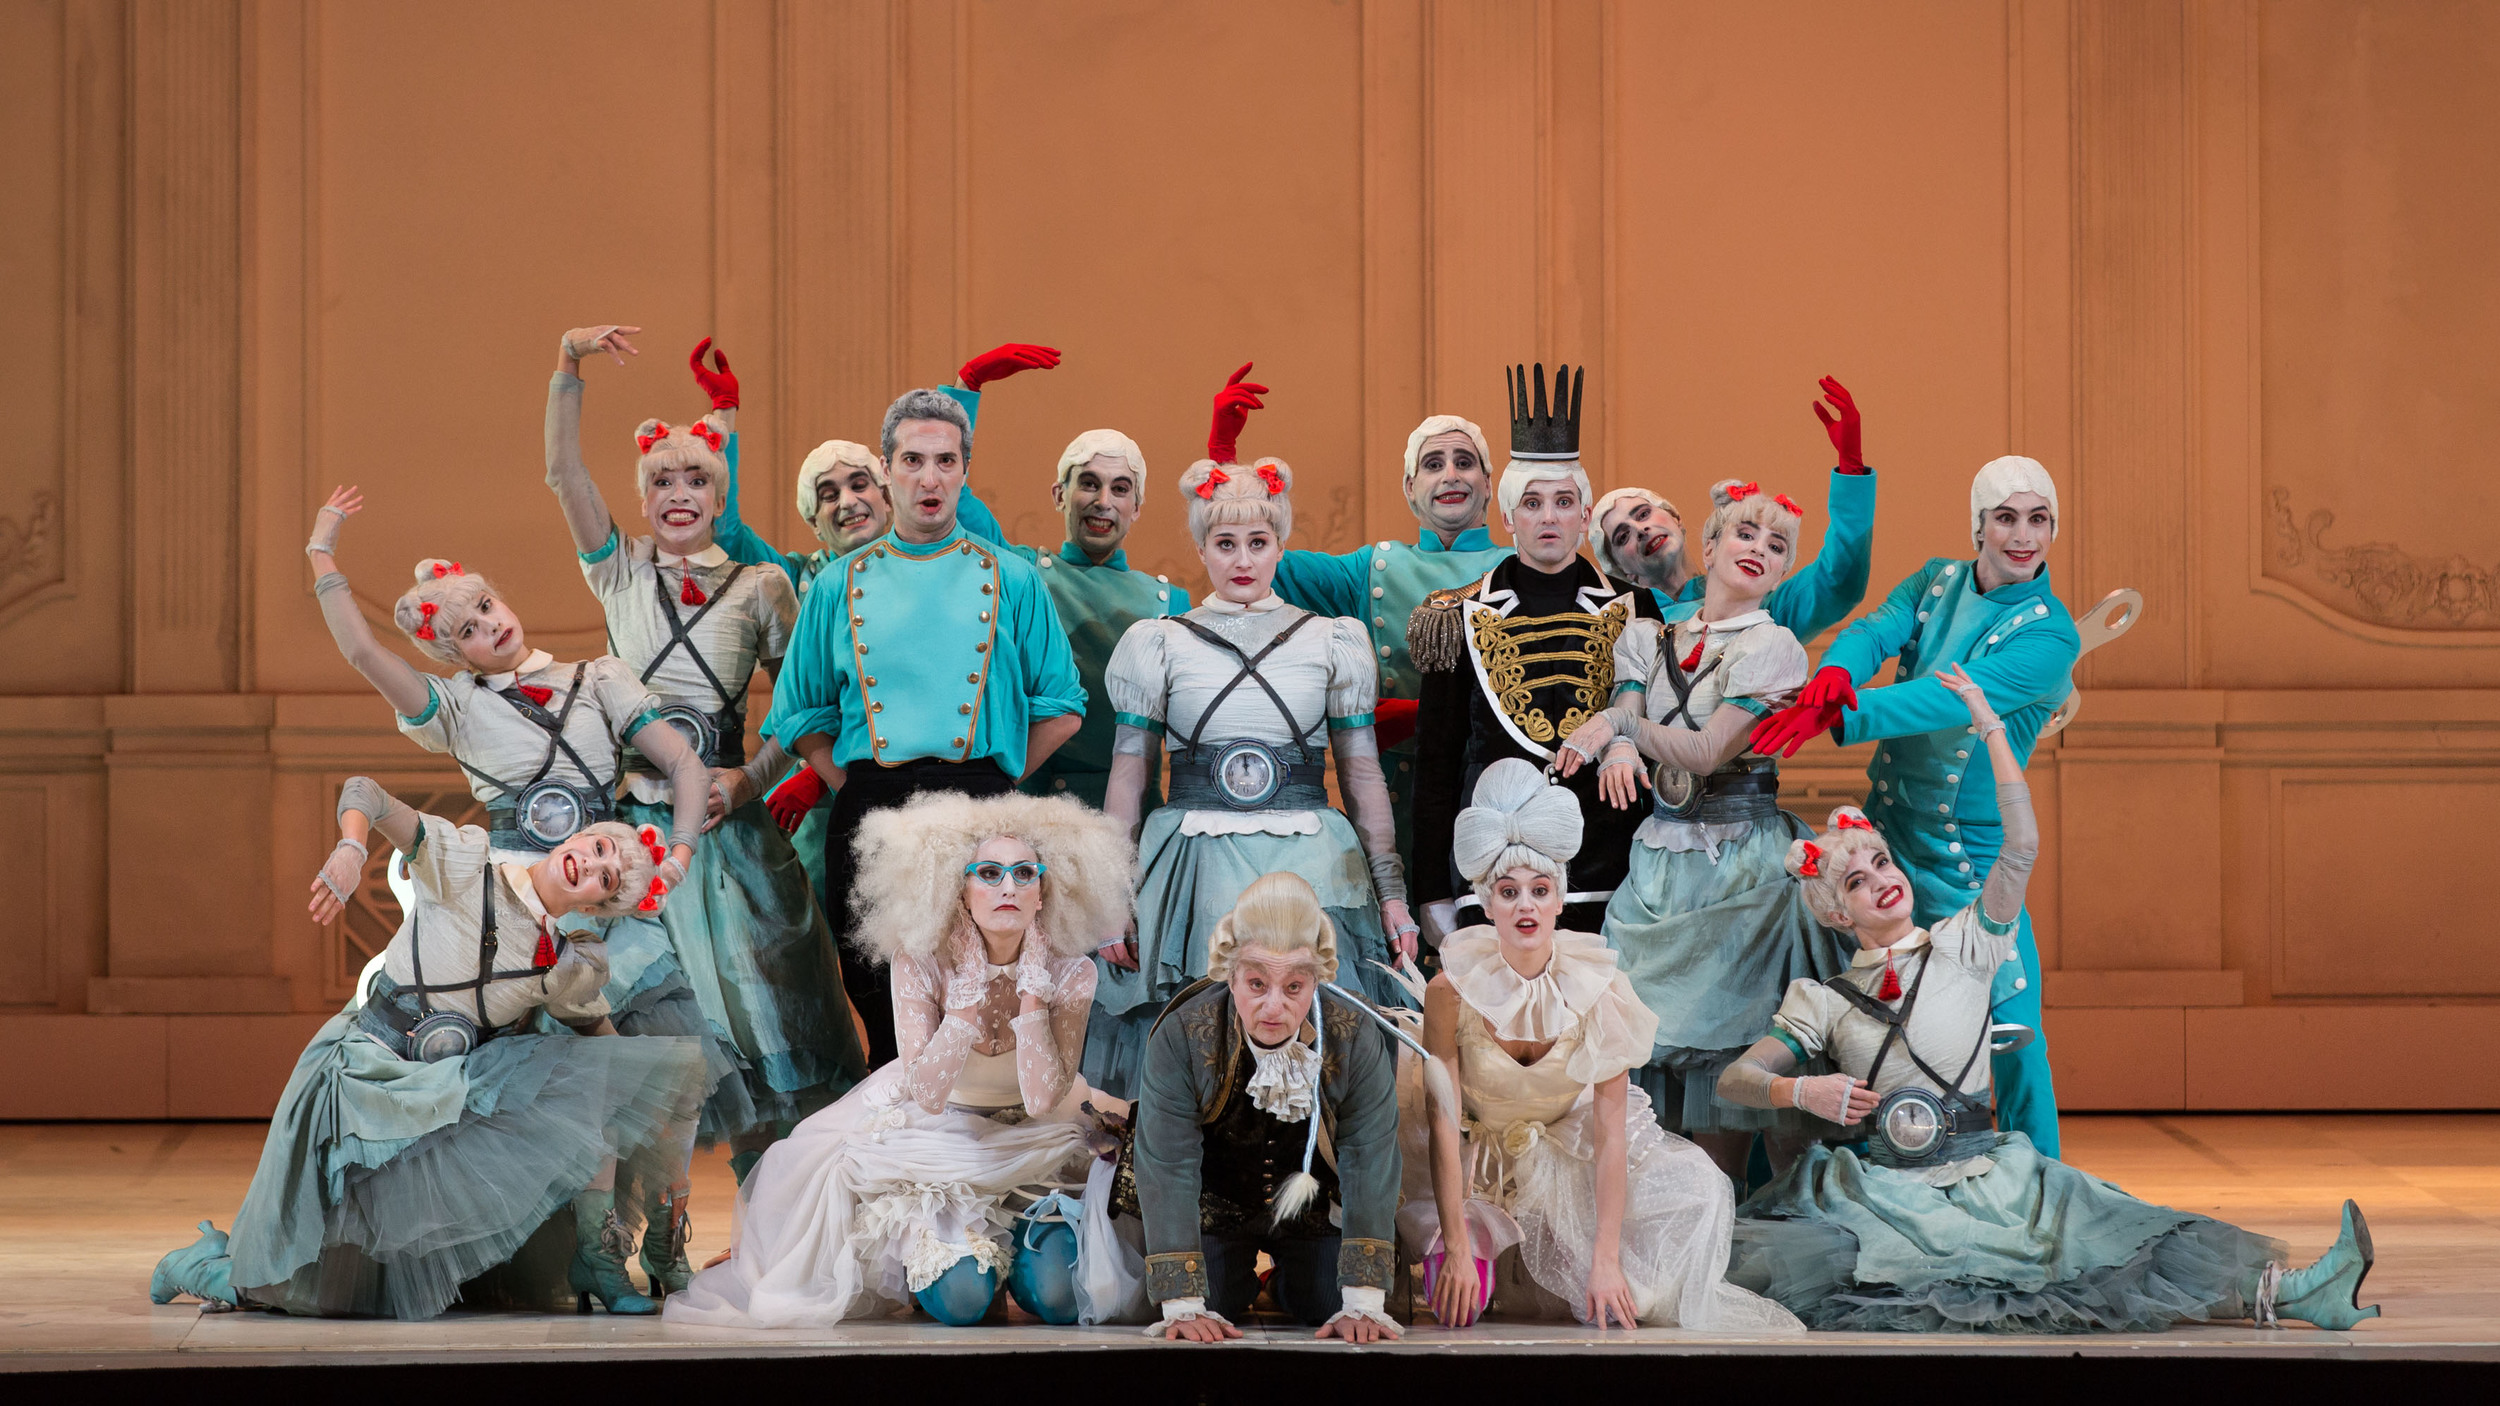 Gioacchino-Rossini-La-Cenerentola-regia-Emma-Dante-®Yasuko-Kageyama-Opera-di-Roma-2015-16-1.jpg